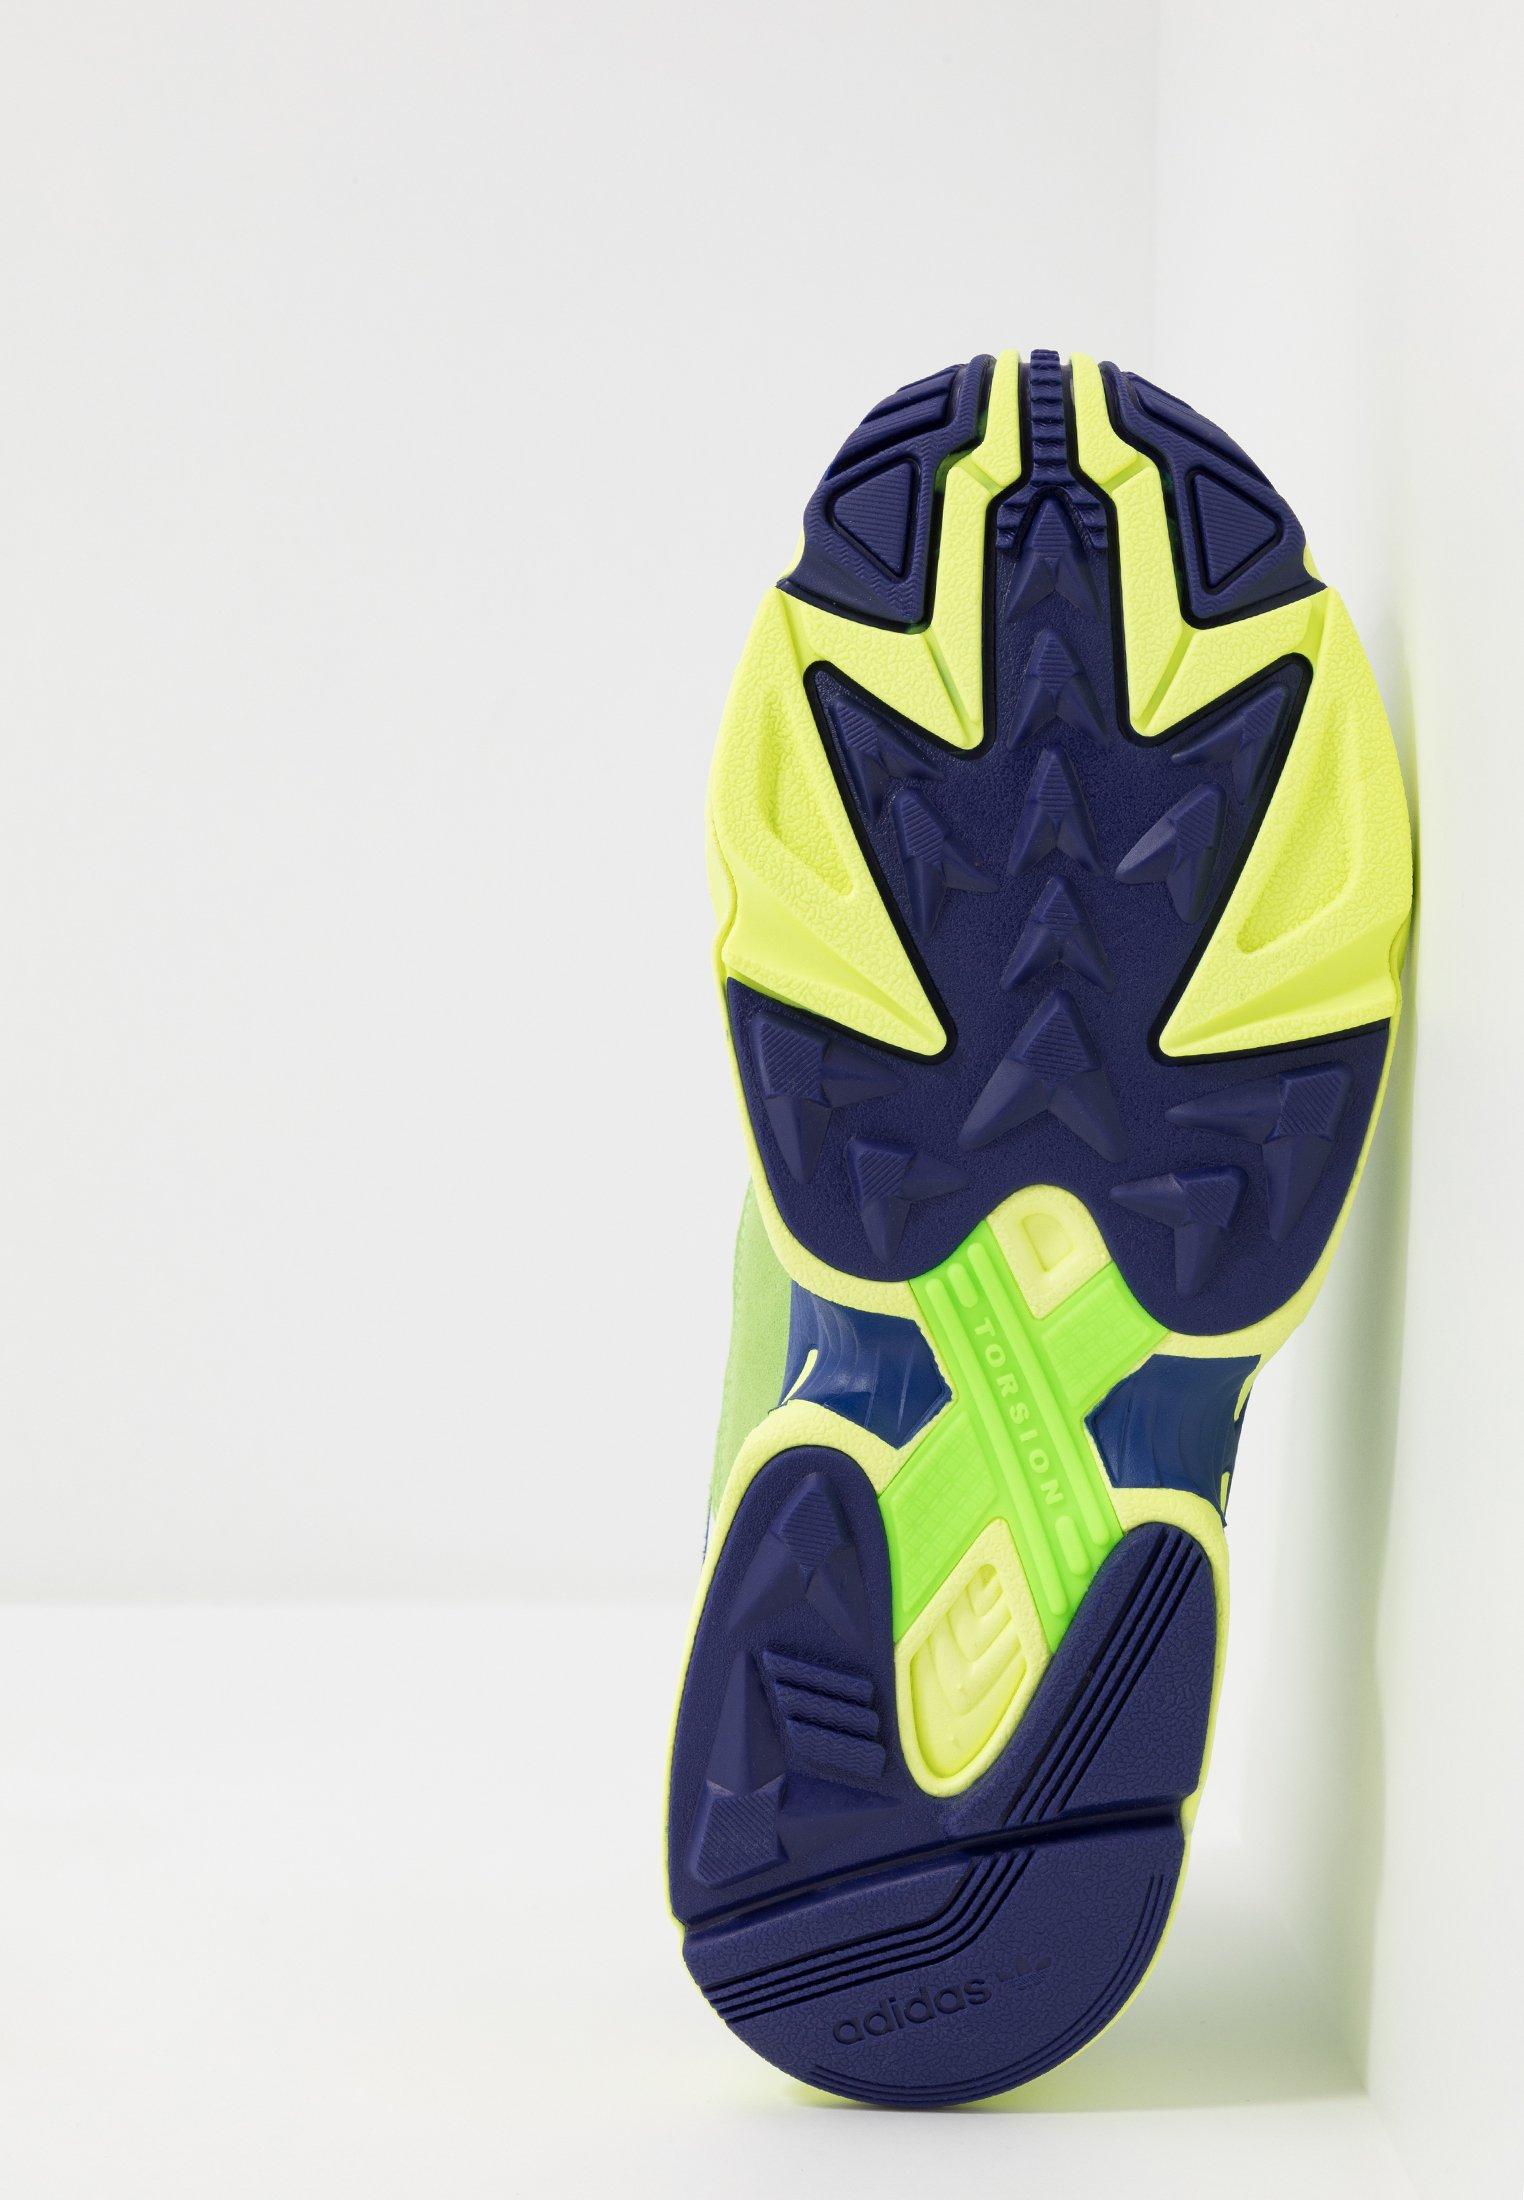 Originals yellow green hi adidas yellow hi bassessolar green solar YUNG purple res real res 1Baskets real purple trQCdxsh